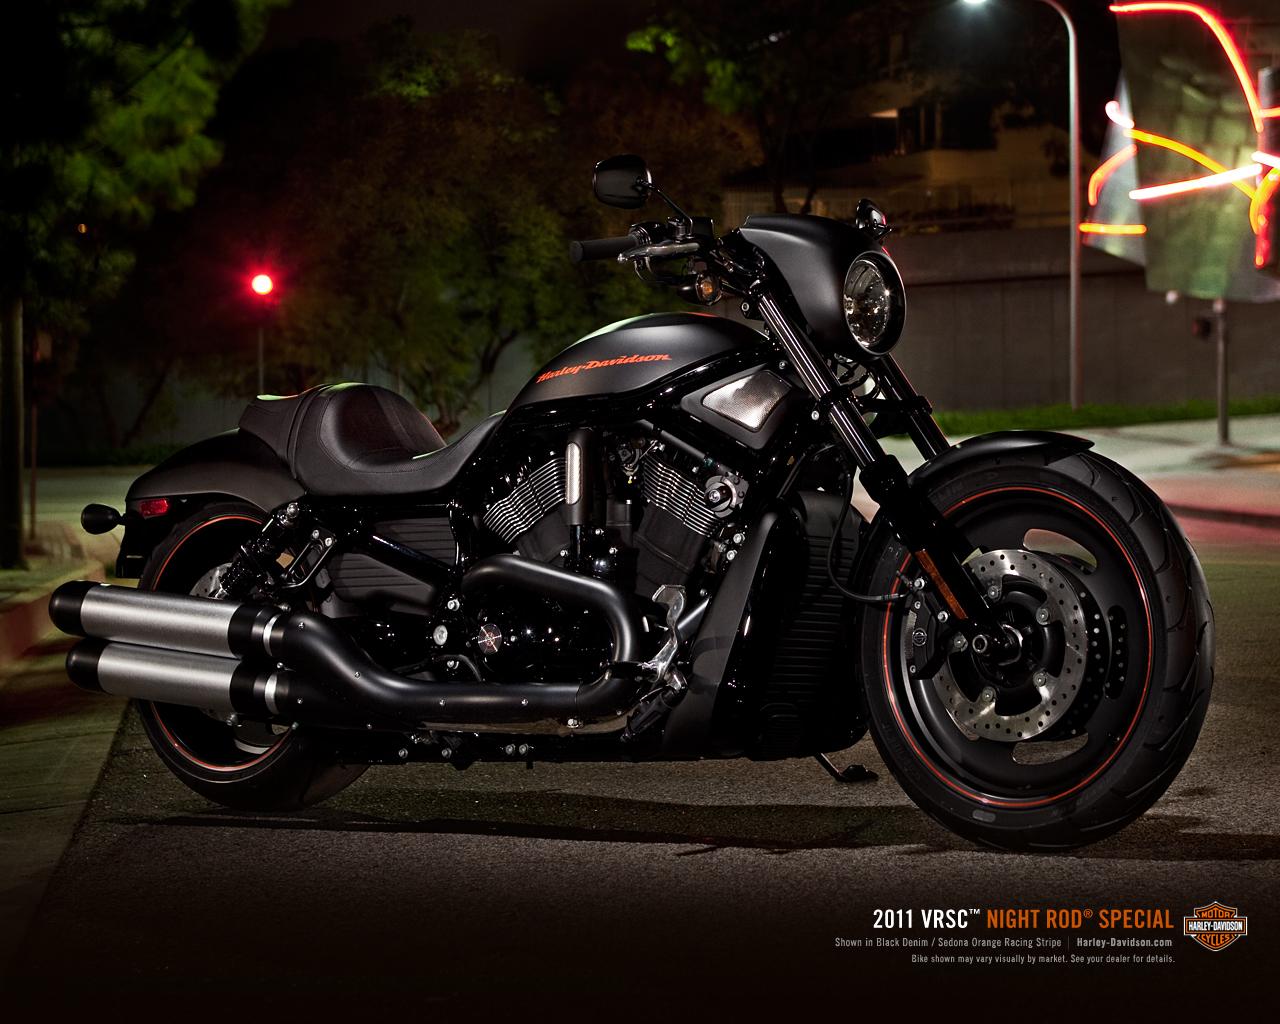 2011 Harley-Davidson Night Rod